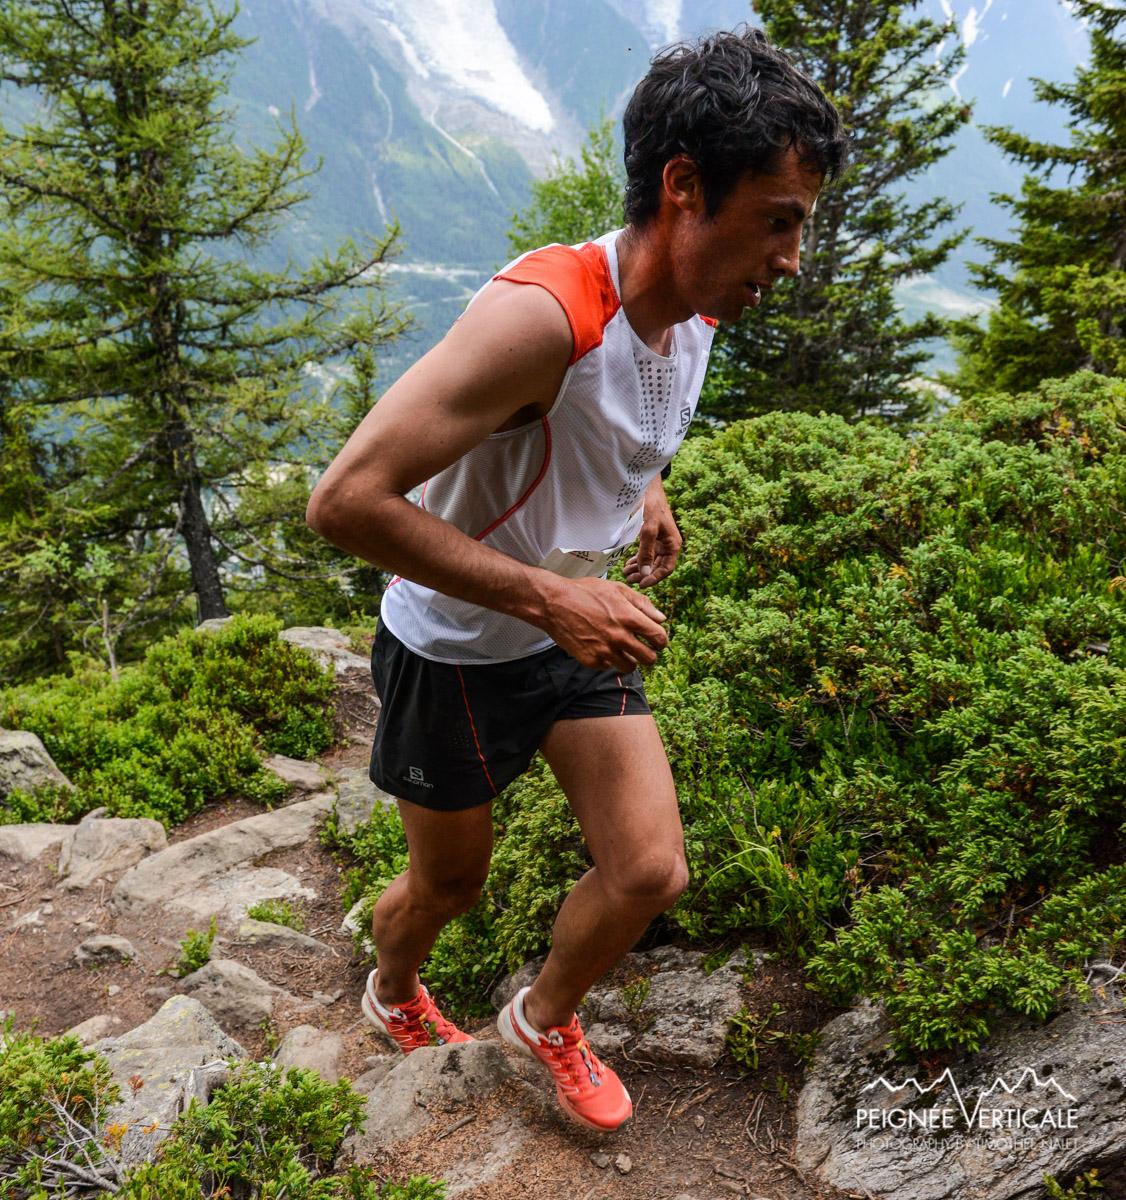 Km-vertical-Chamonix-Skyrunning-2014-Timothee-Nalet-3346.jpg